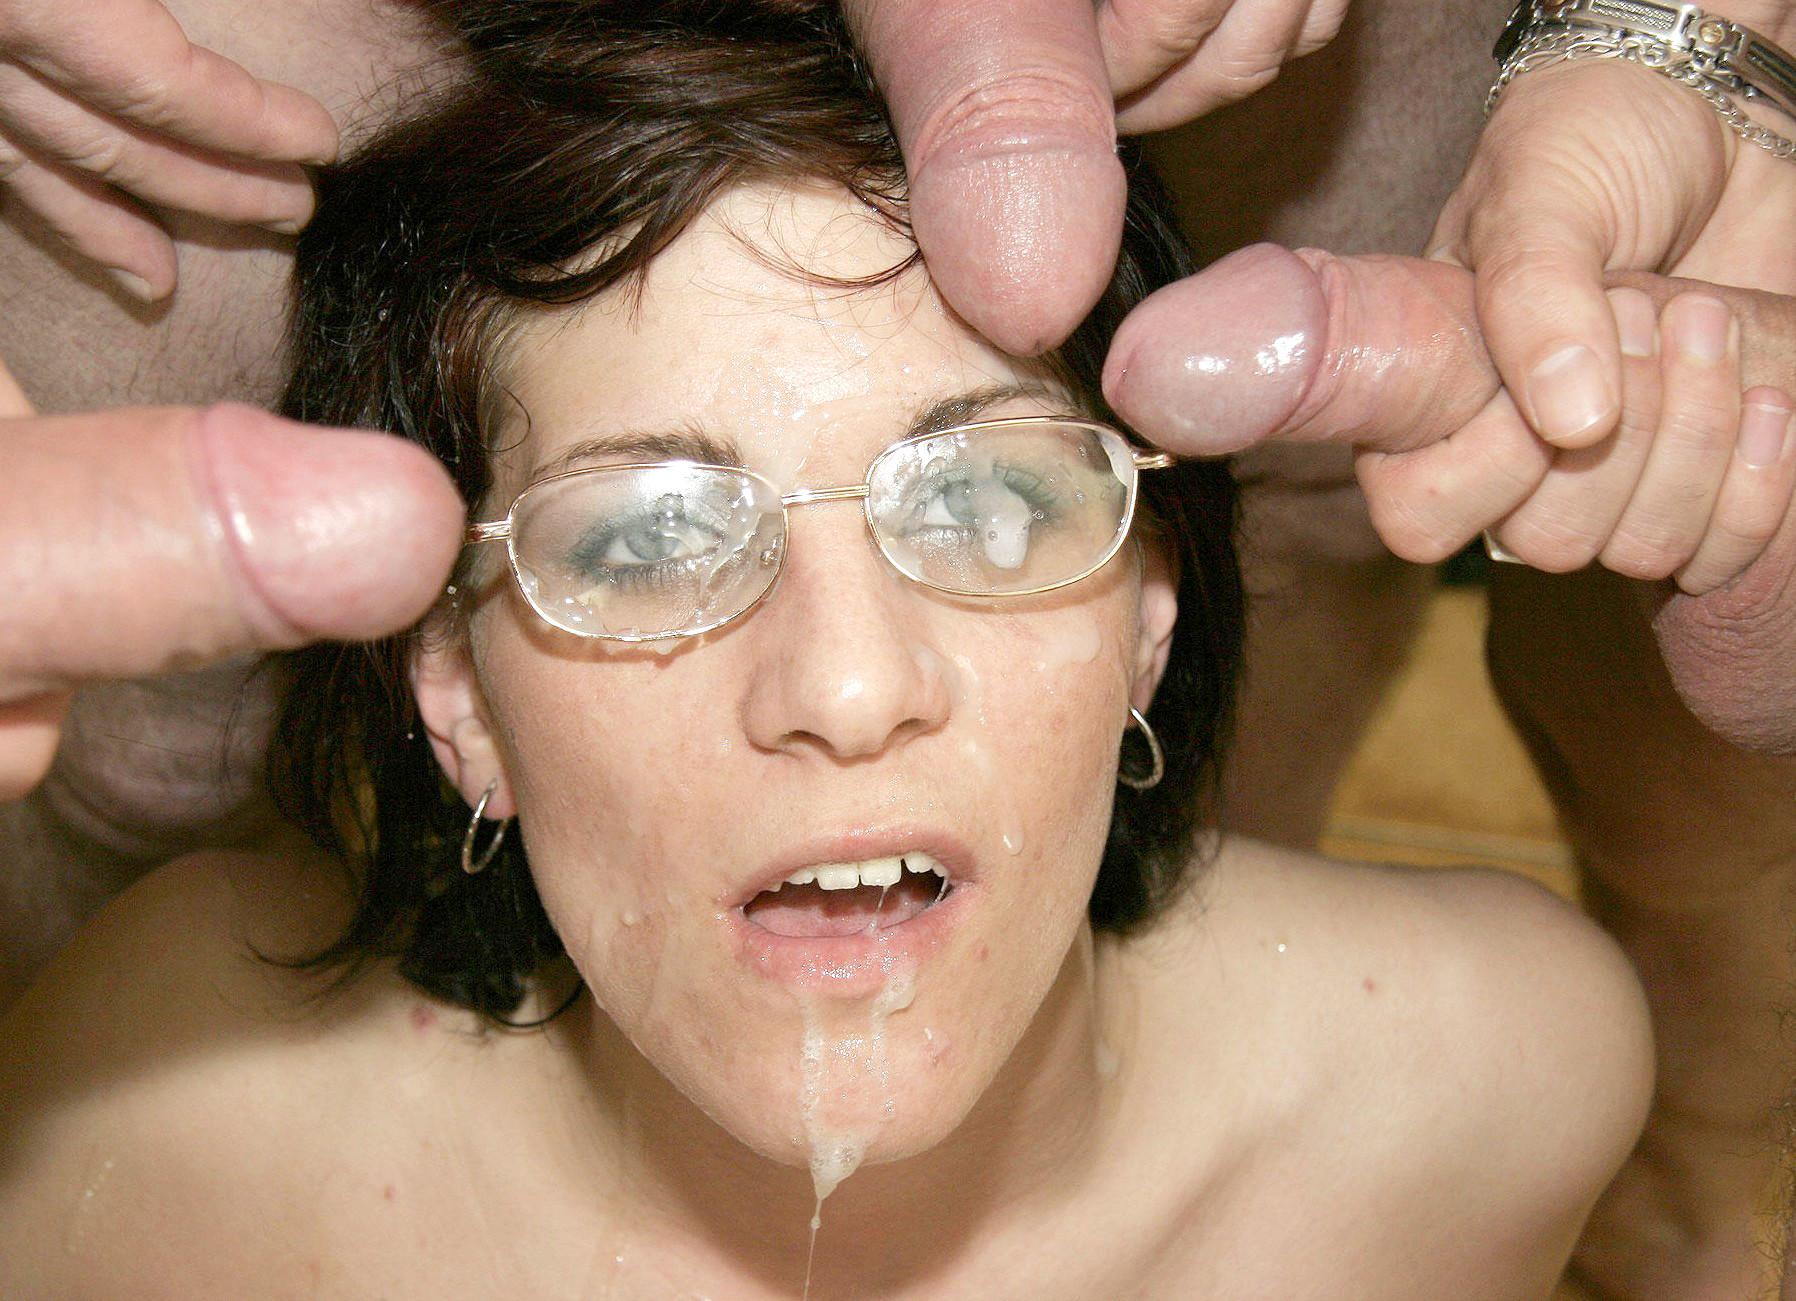 Сперма на лицо фот, Сперма на лицах девушек фото 10 фотография